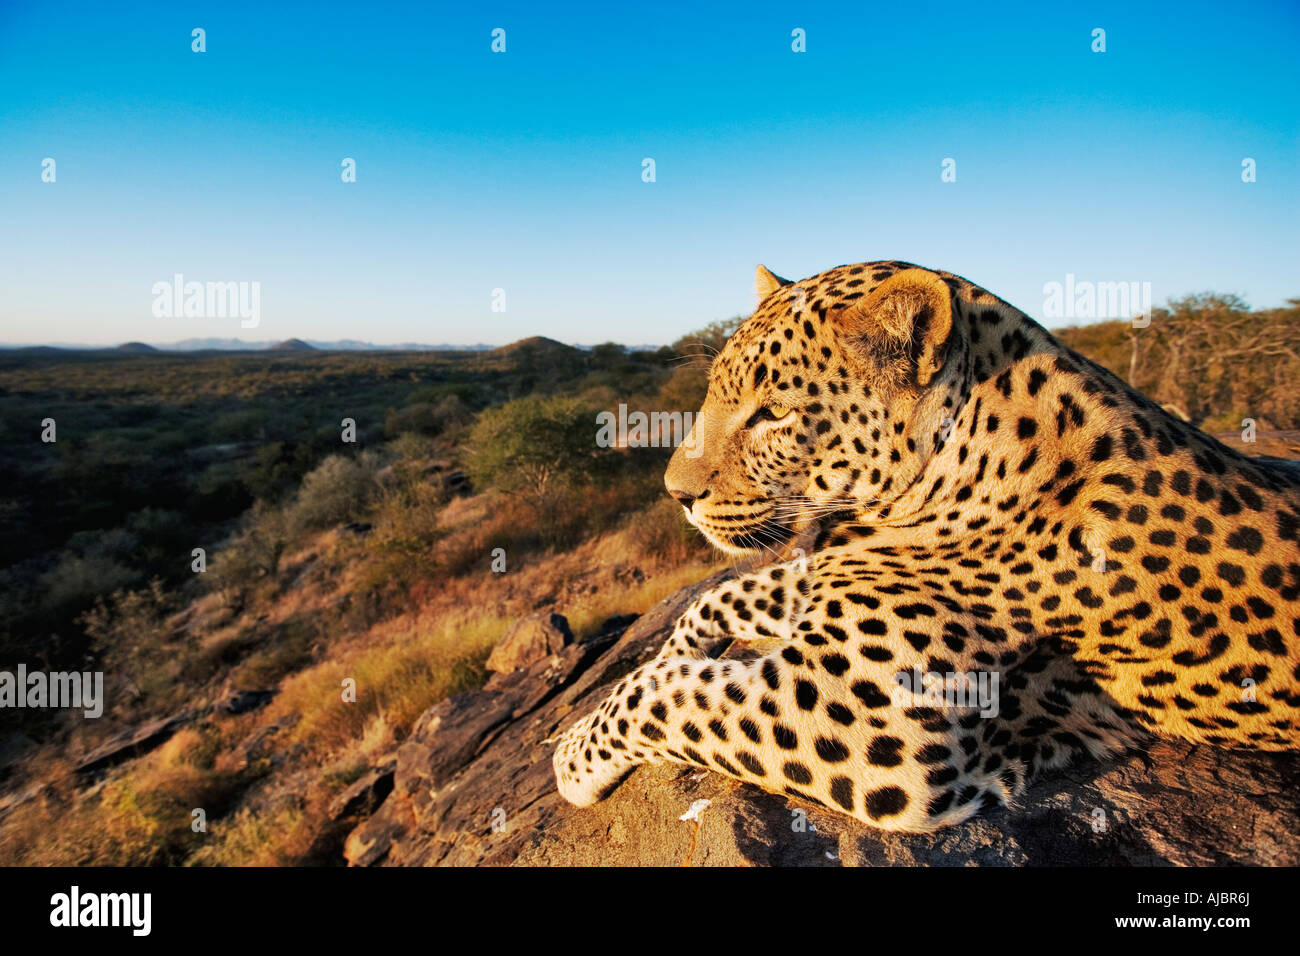 Leopard (Panthera pardus) Lying on Rock - Stock Image